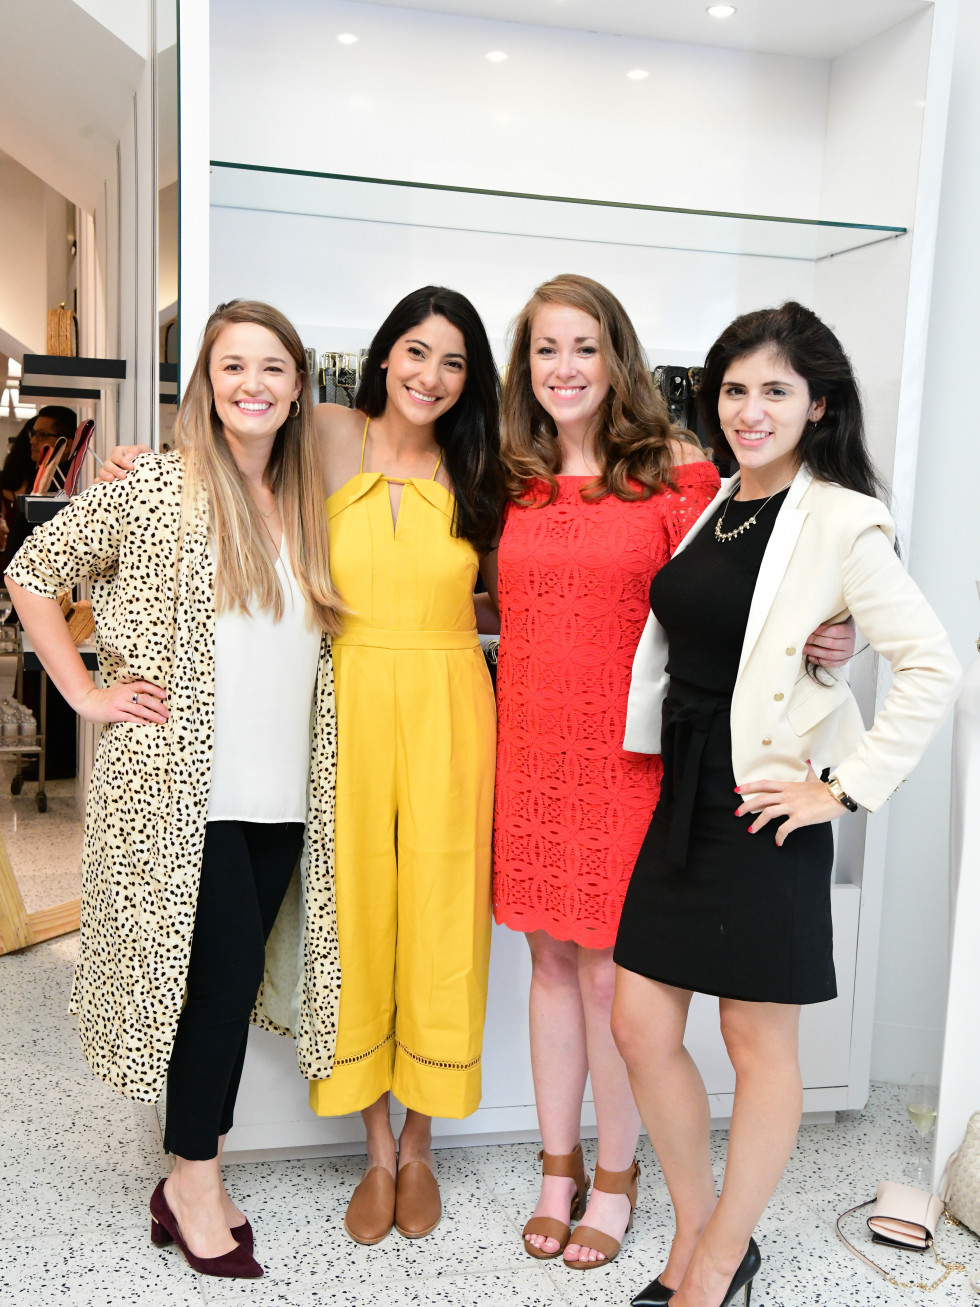 Summer Soiree Dress for Success WOW Tootsies Julia Russell, Dalia Steichen, Jessie Mehlhoff, Julia Valencia